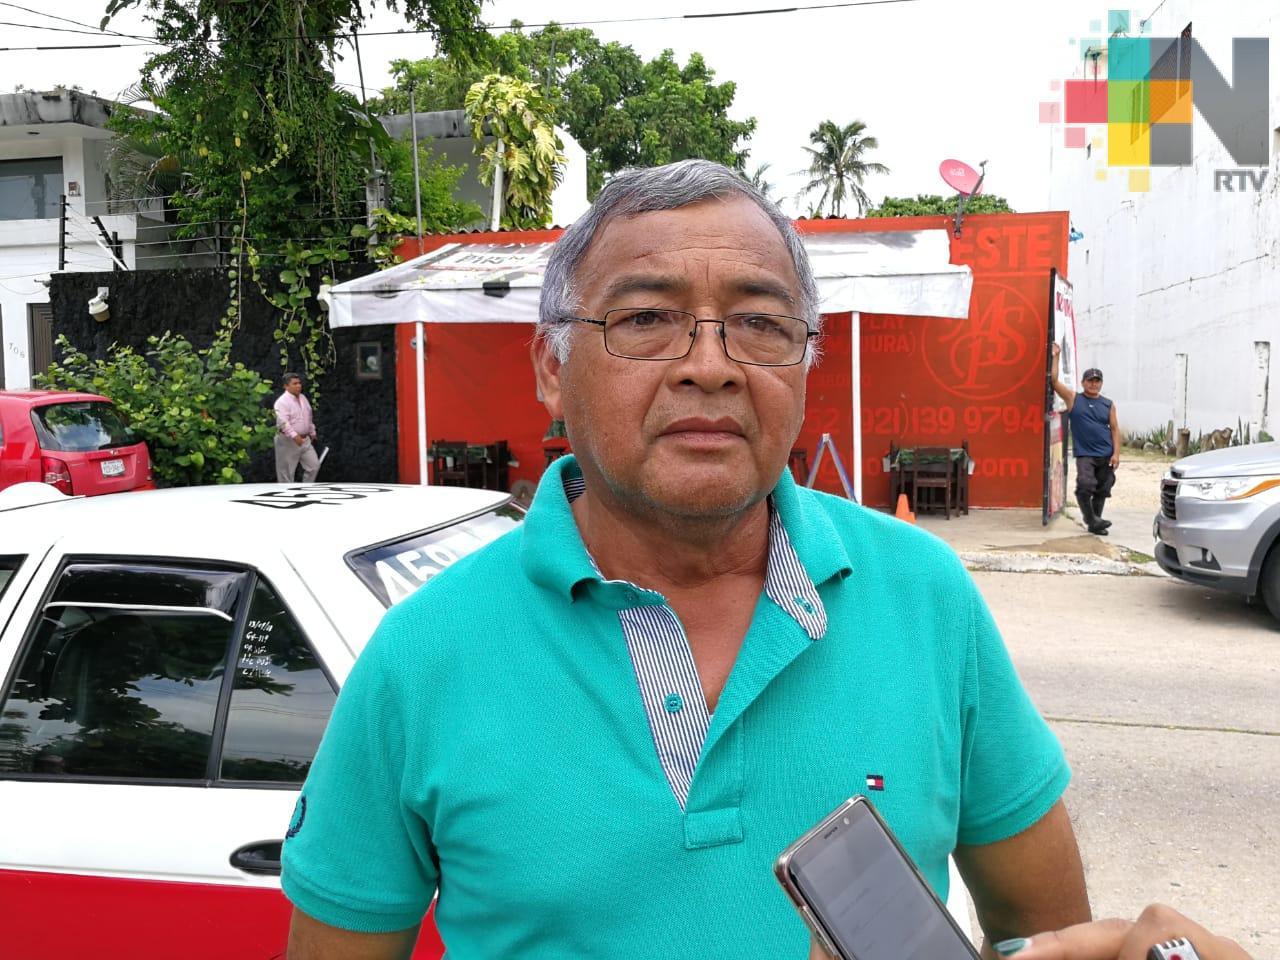 Choferes de autobús provocaron aumento de taxis colectivos, acusa líder de taxistas